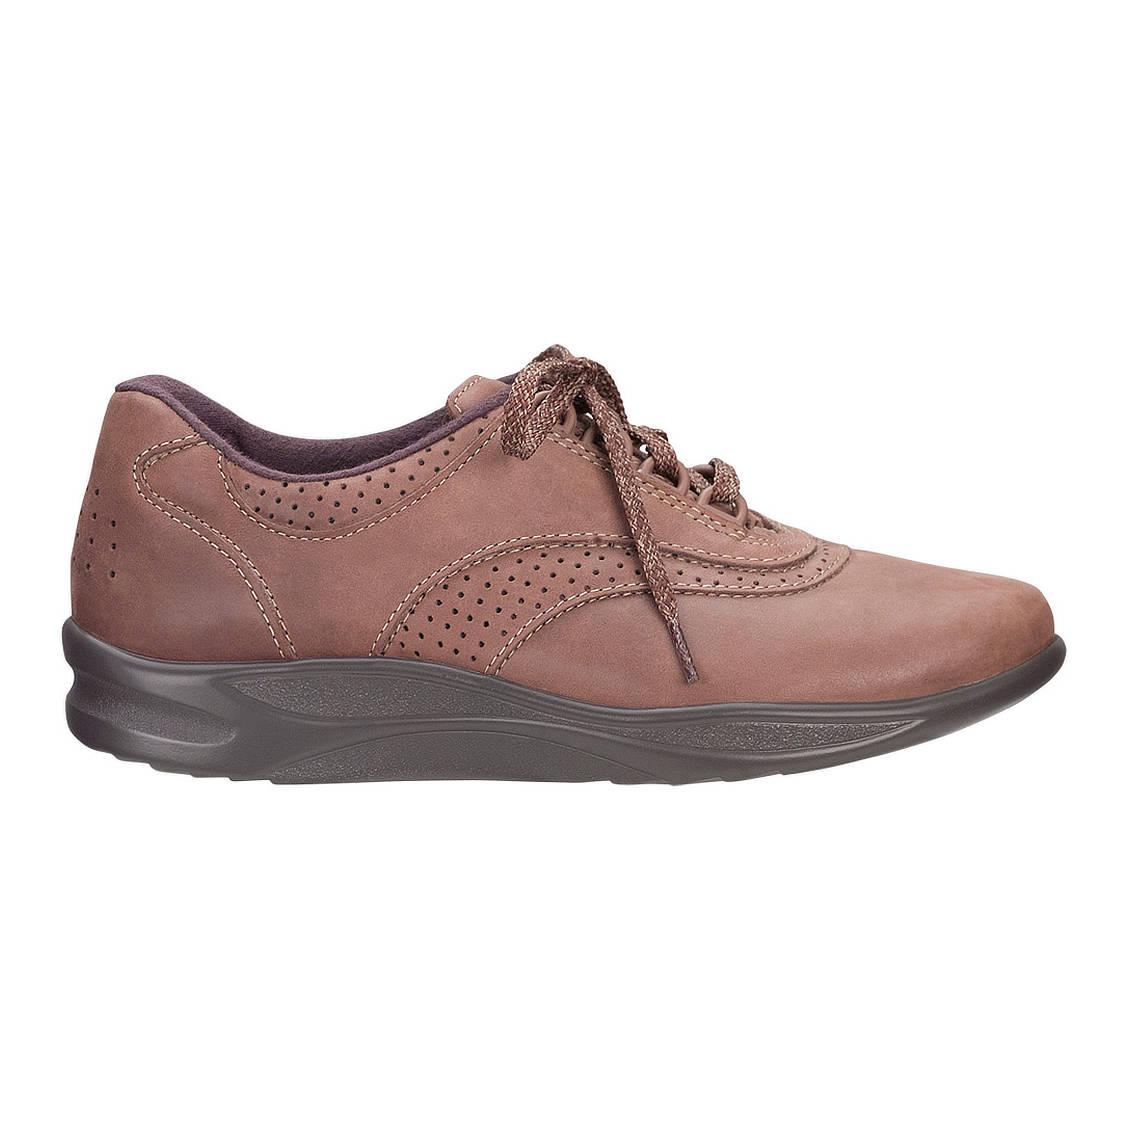 sas-womens-walk-easy-chocolate-nubuck-2380-076-3